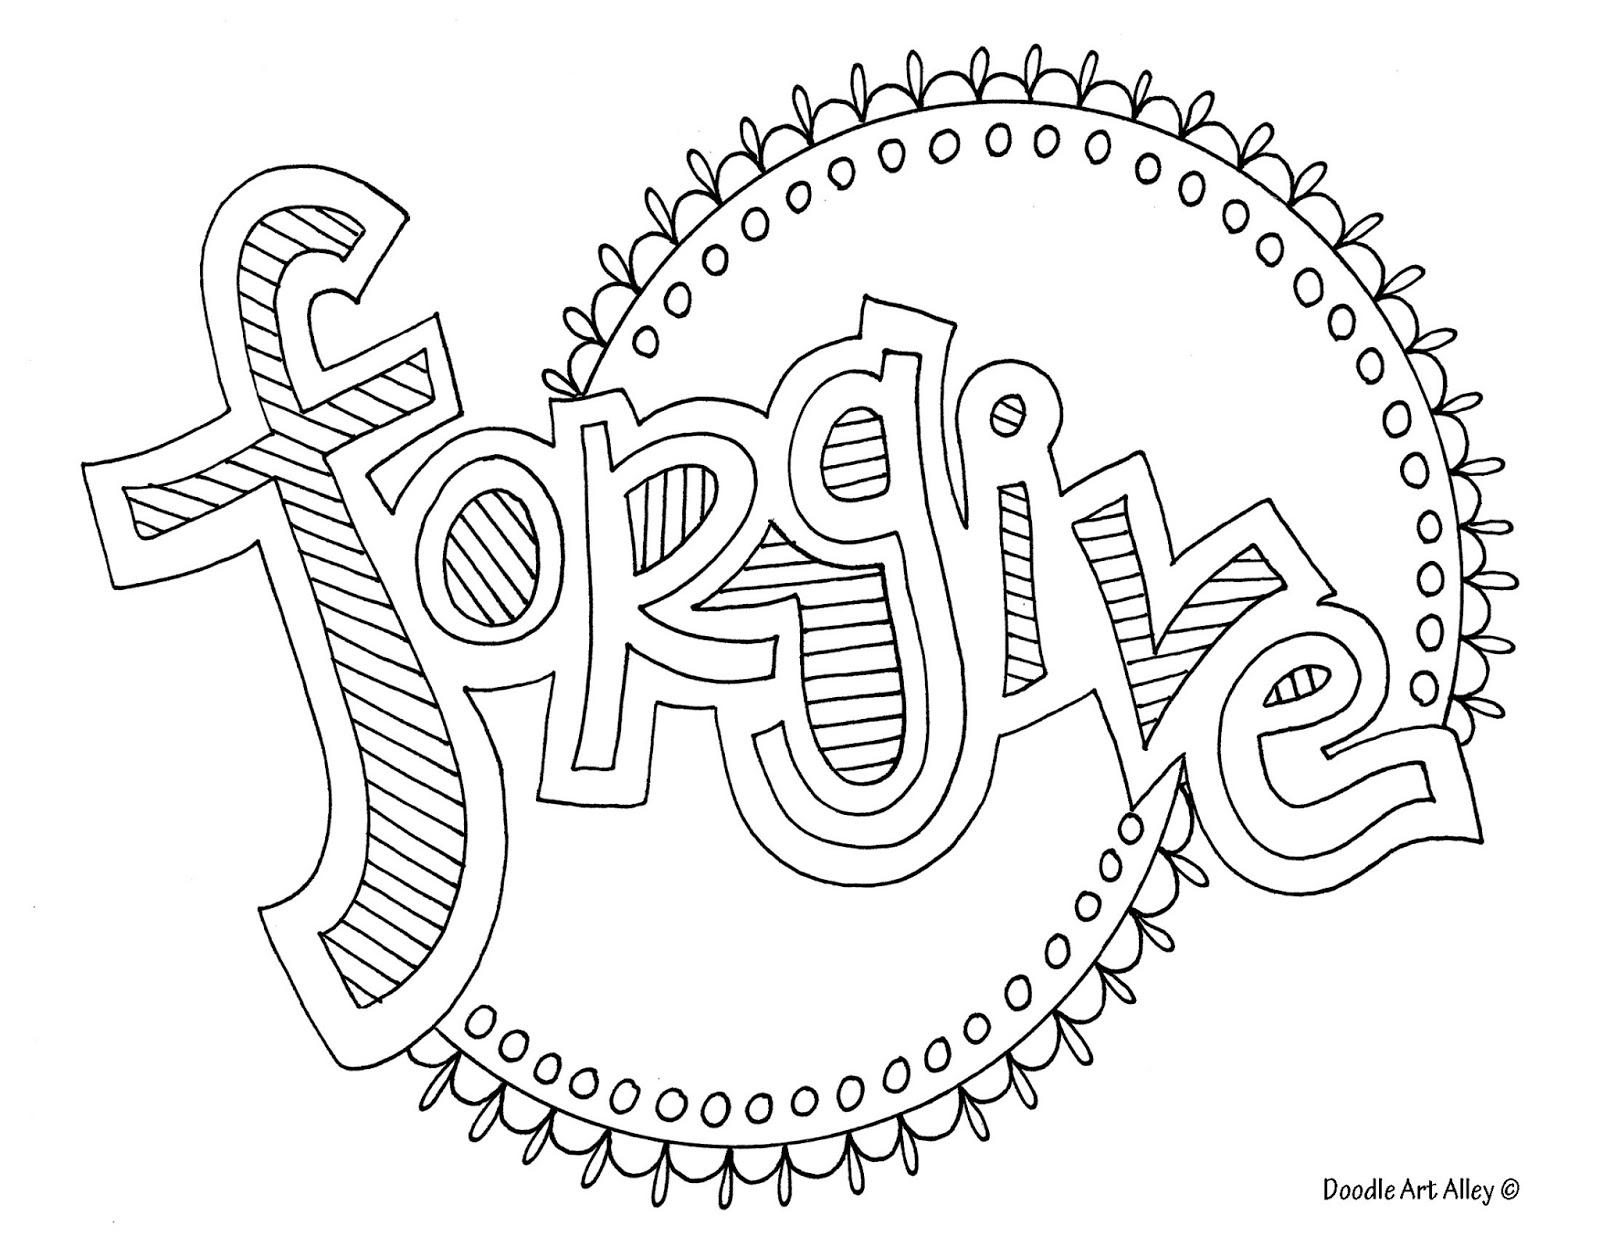 Do You F.R.O.G ?: Kiss and Make Up with Forgiveness